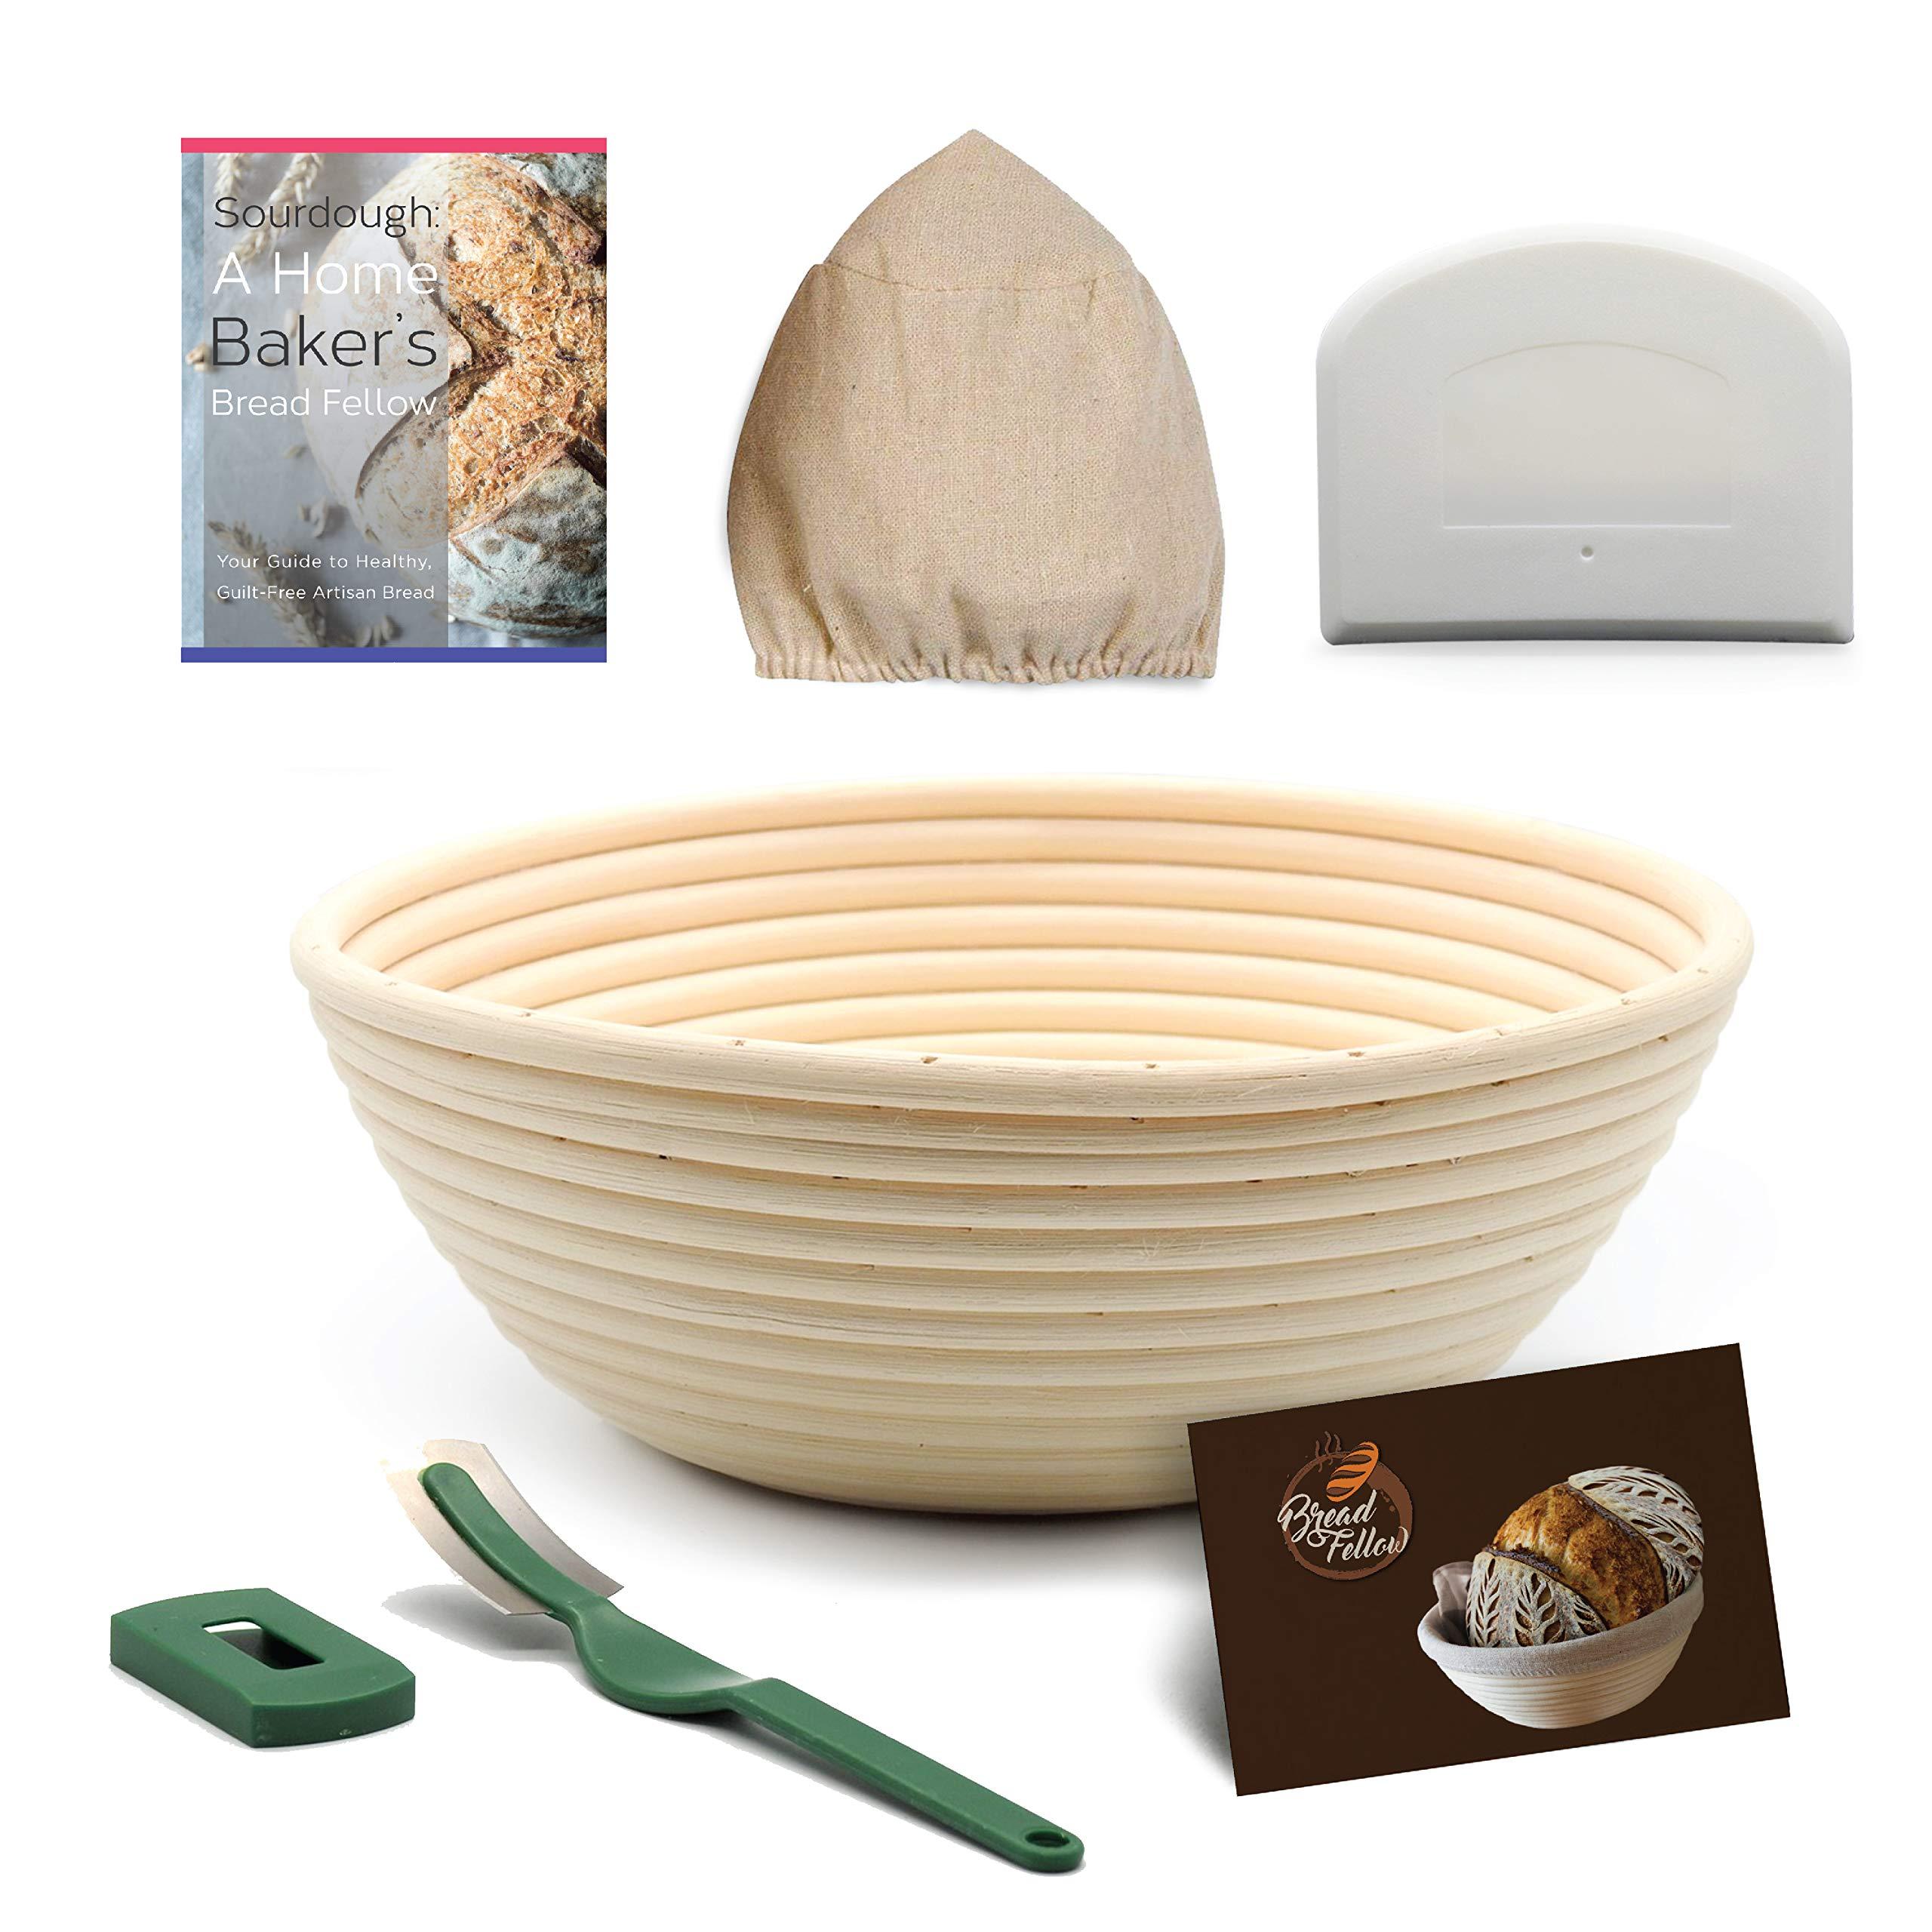 Banneton Bread Proofing Basket Set: 9 inch Round Brotform Bread Basket Dough Bowl | Cloth Liner | Dough Scraper | Bread Lame | Sourdough Recipe - For Professional and Home Bakers Artisan Bread Making